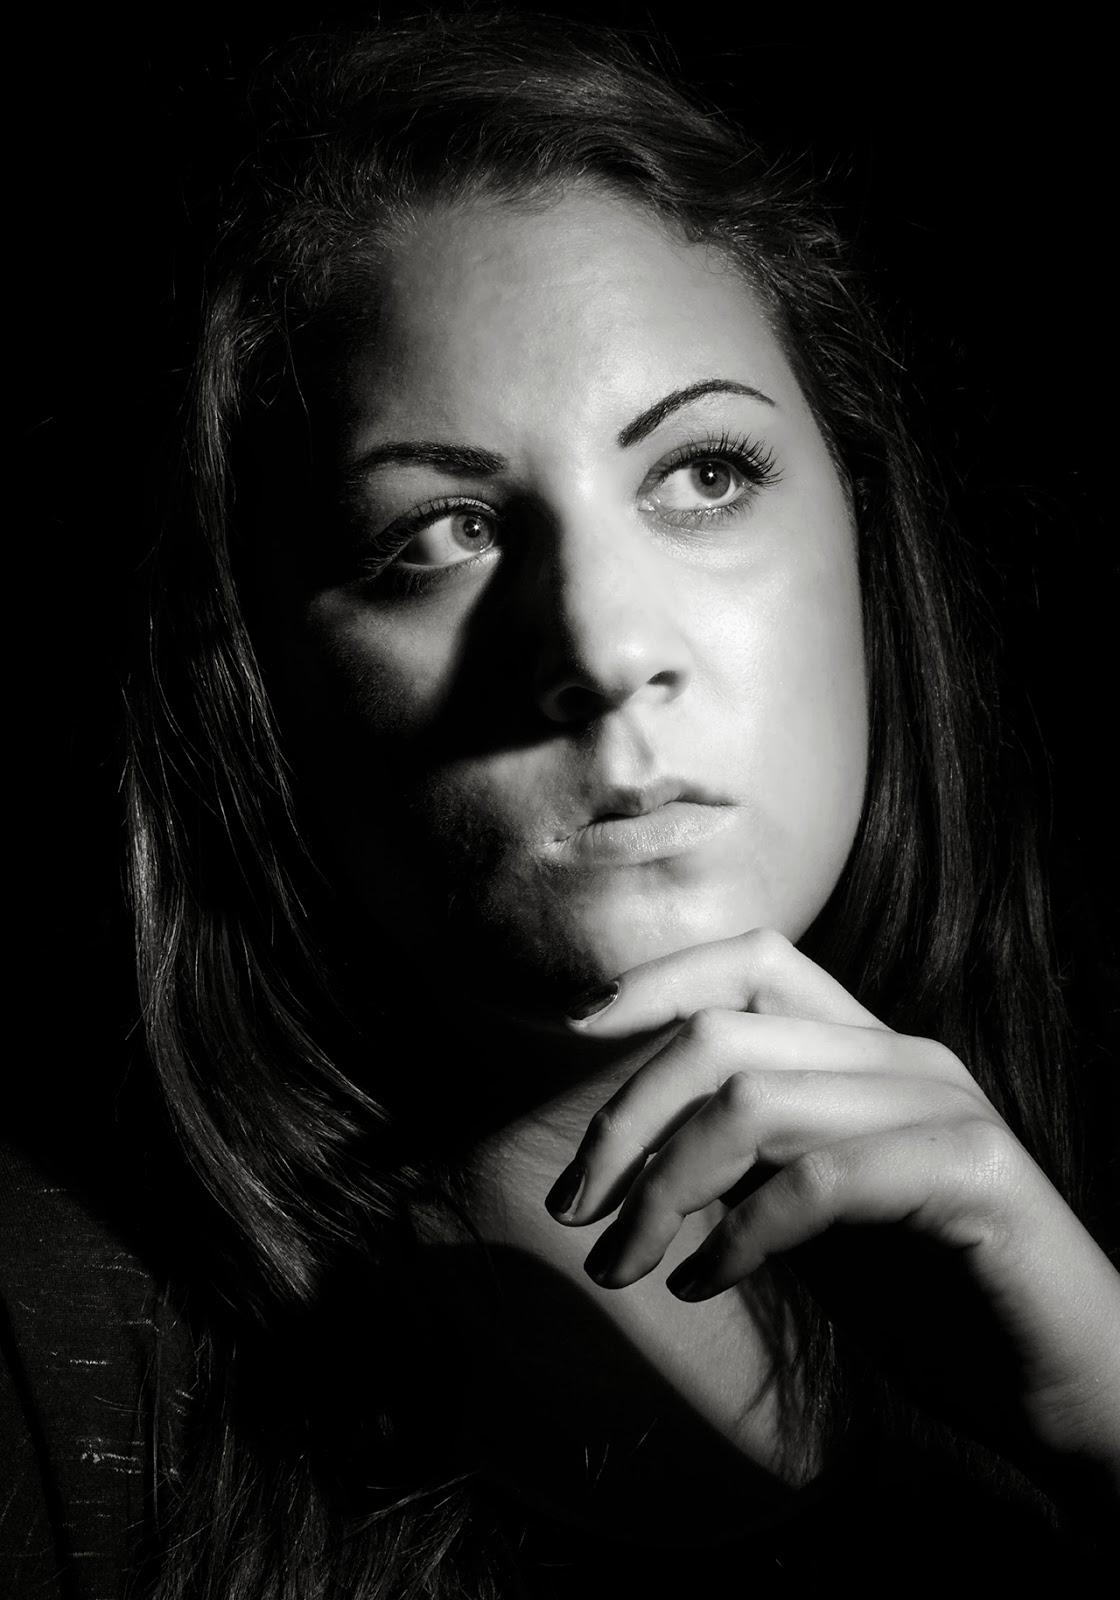 Hollywood Lighting  sc 1 st  Erica Brinicombe Photography & Hollywood Lighting | Erica Brinicombe Photography